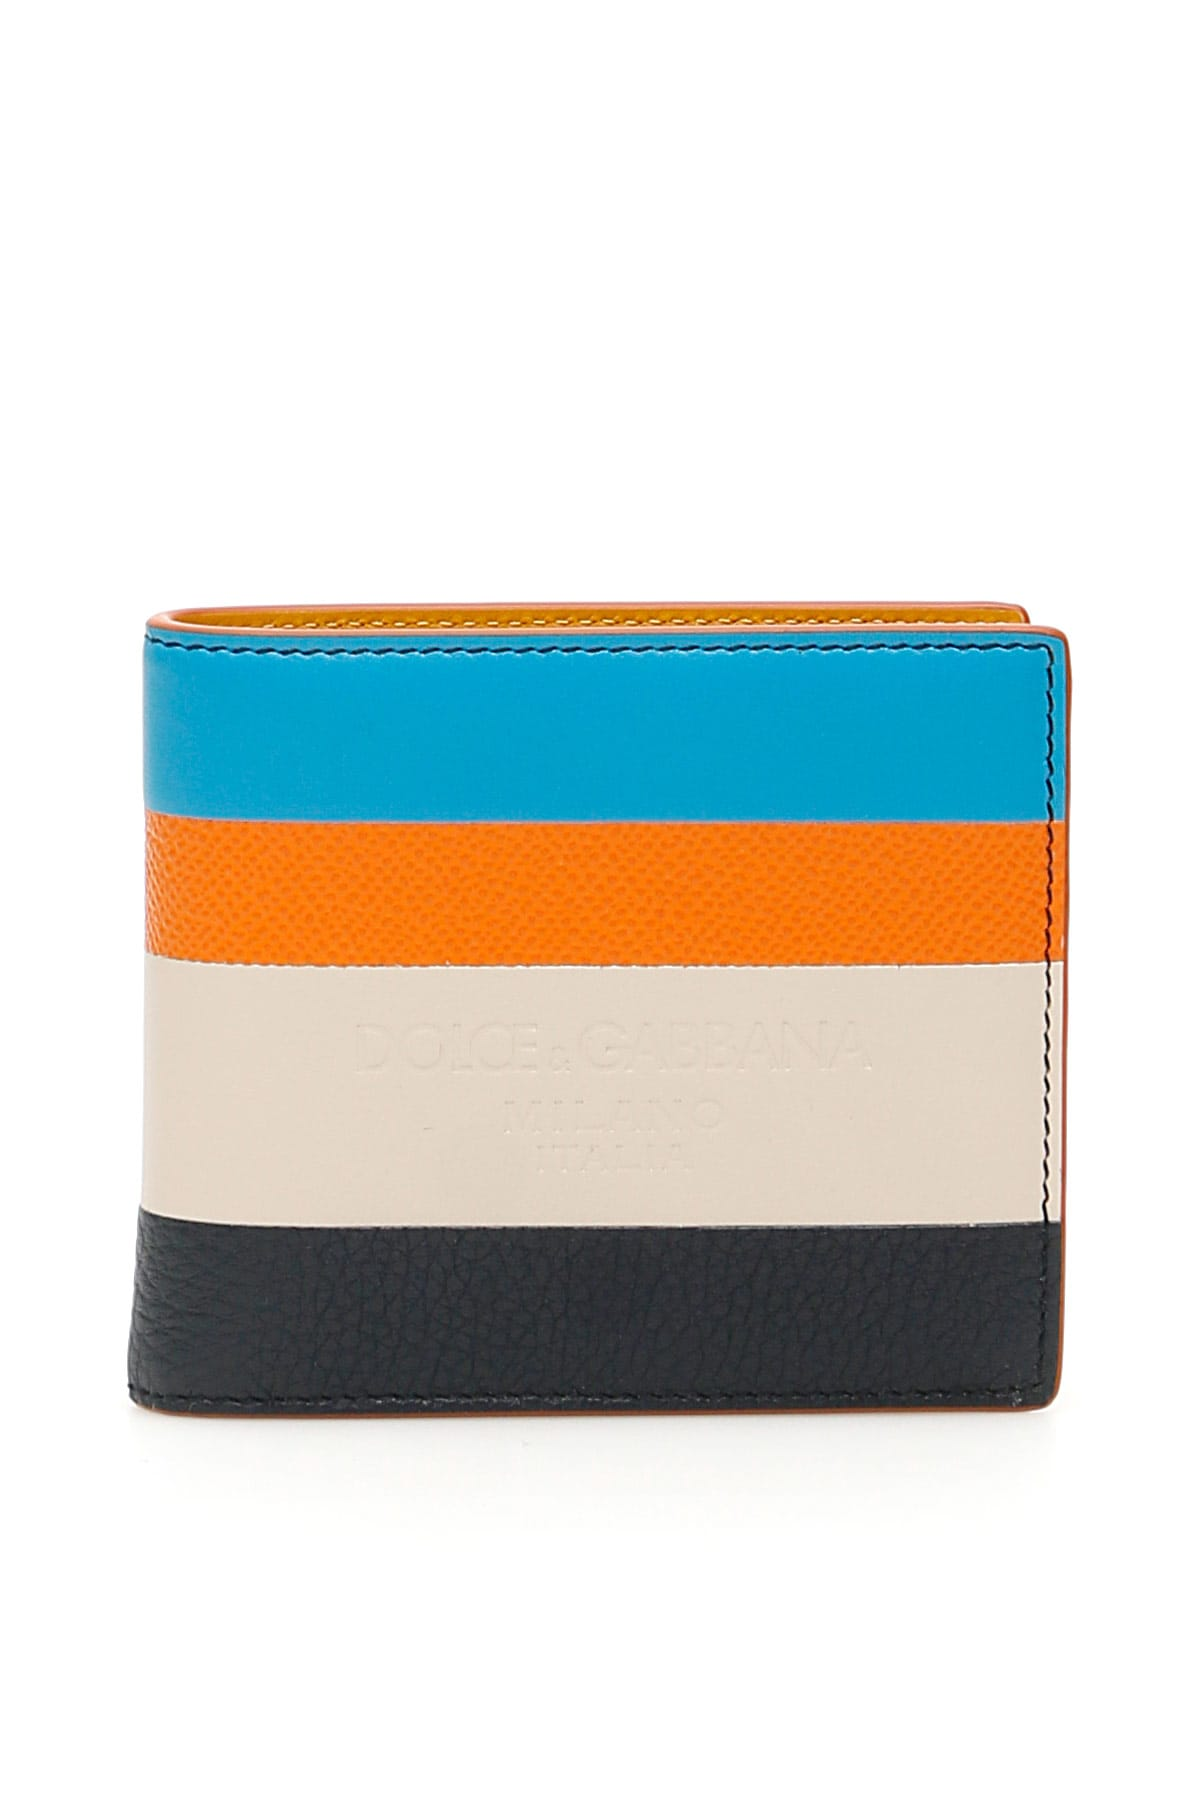 Dolce & Gabbana Multicolor Stripe Wallet